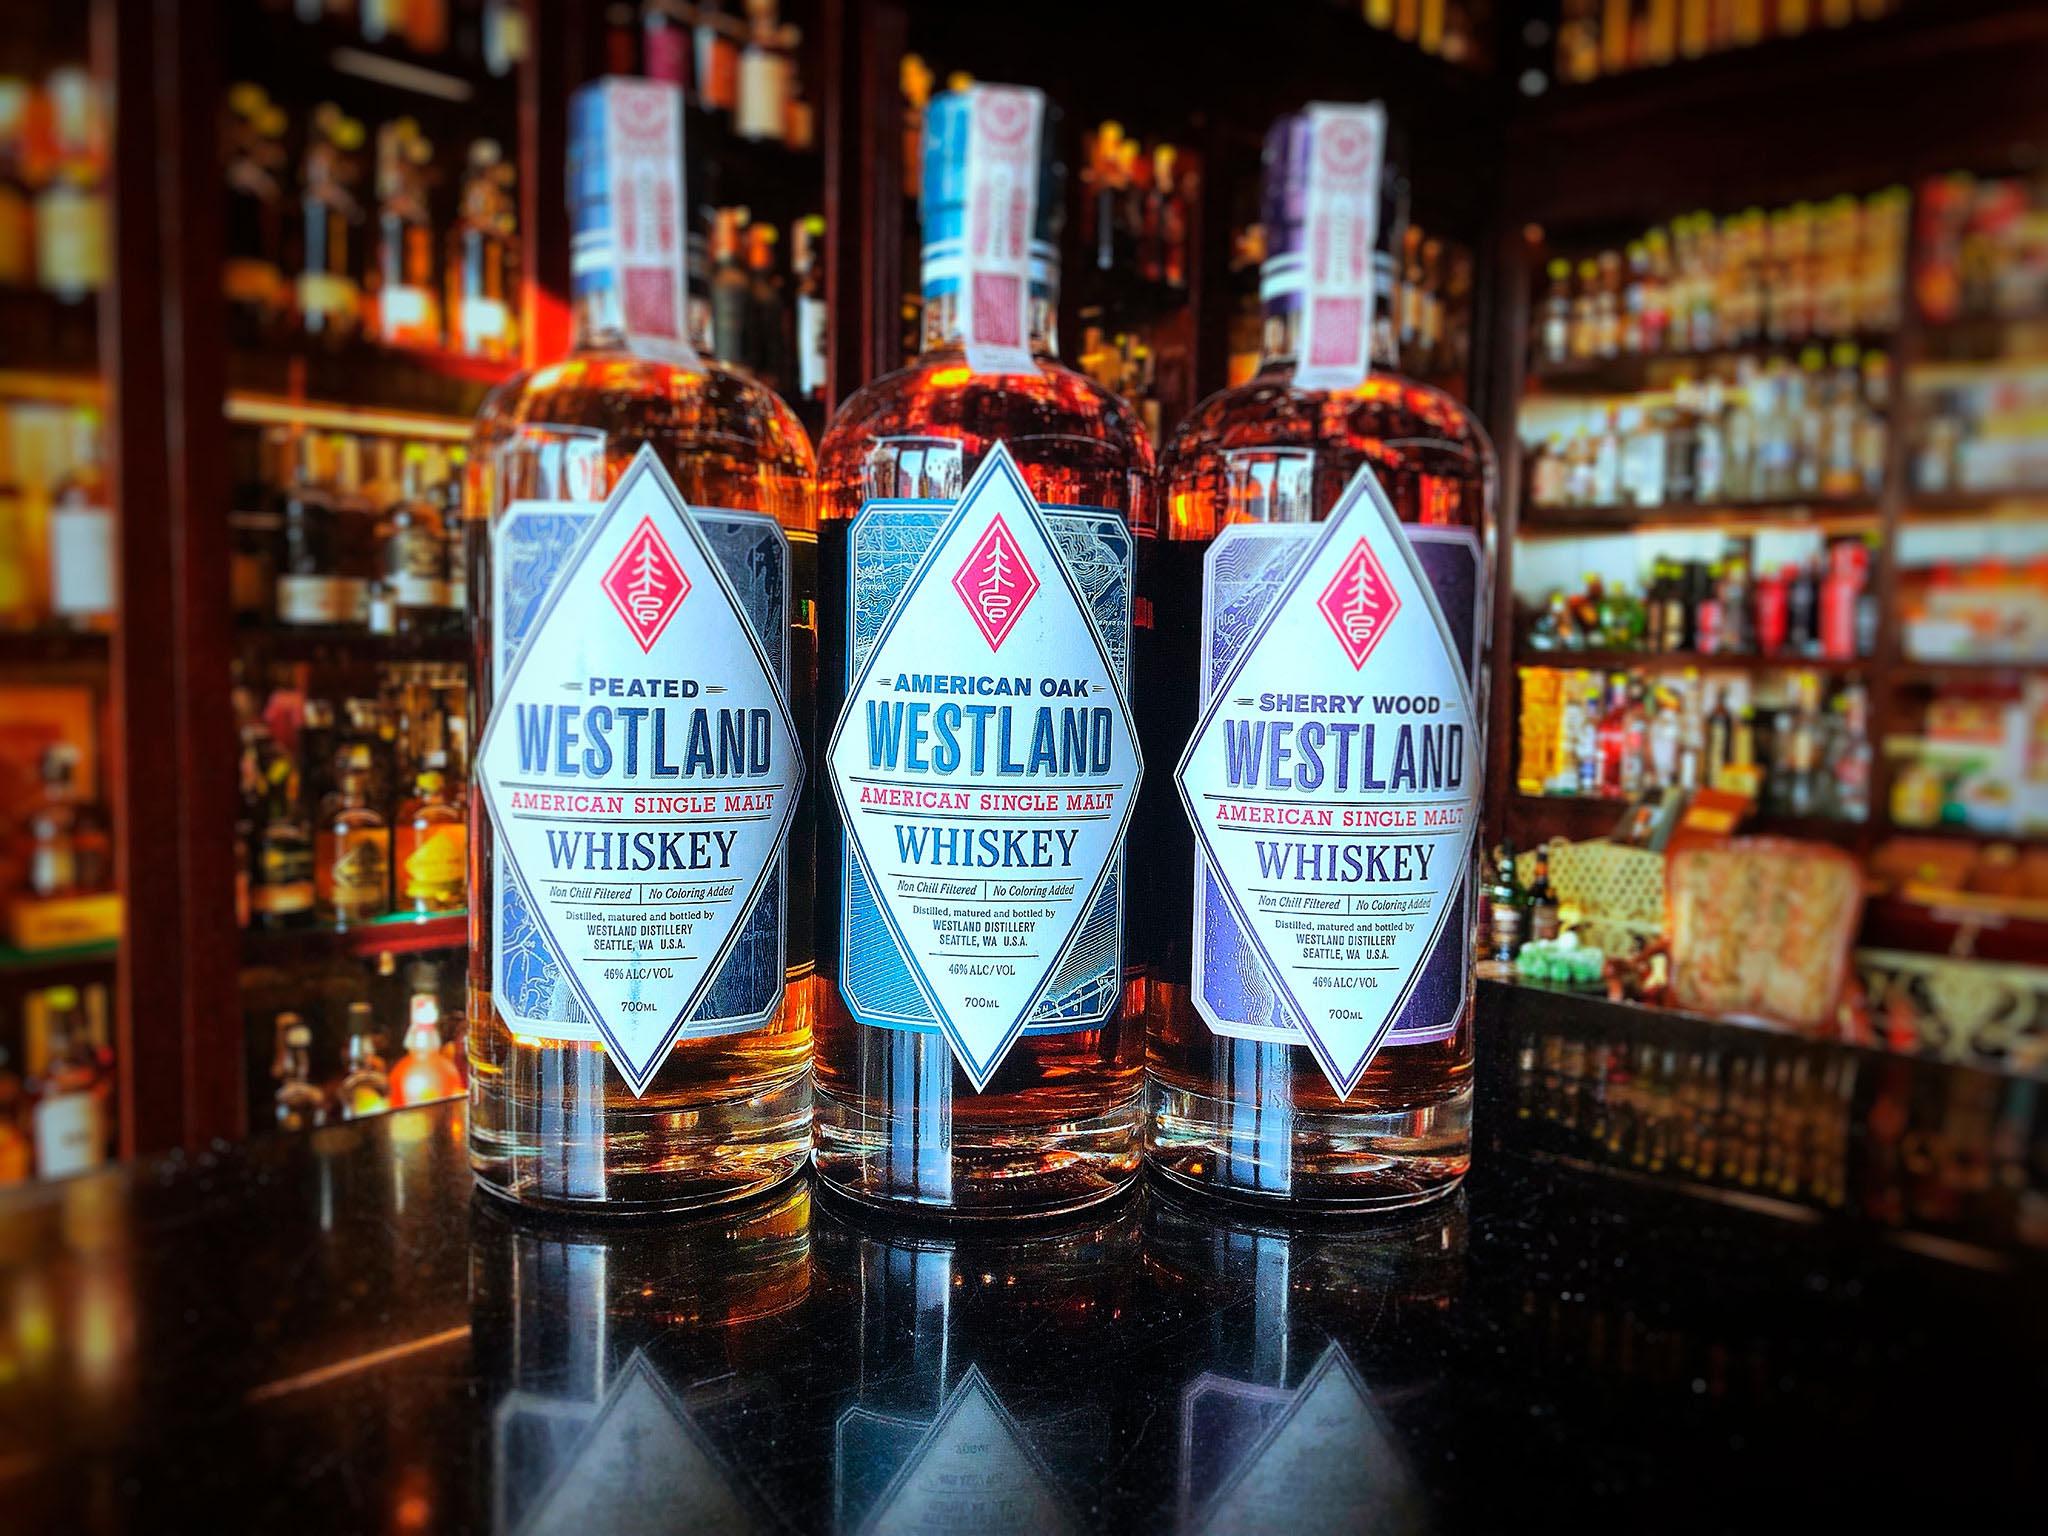 Westland single malt whisky!